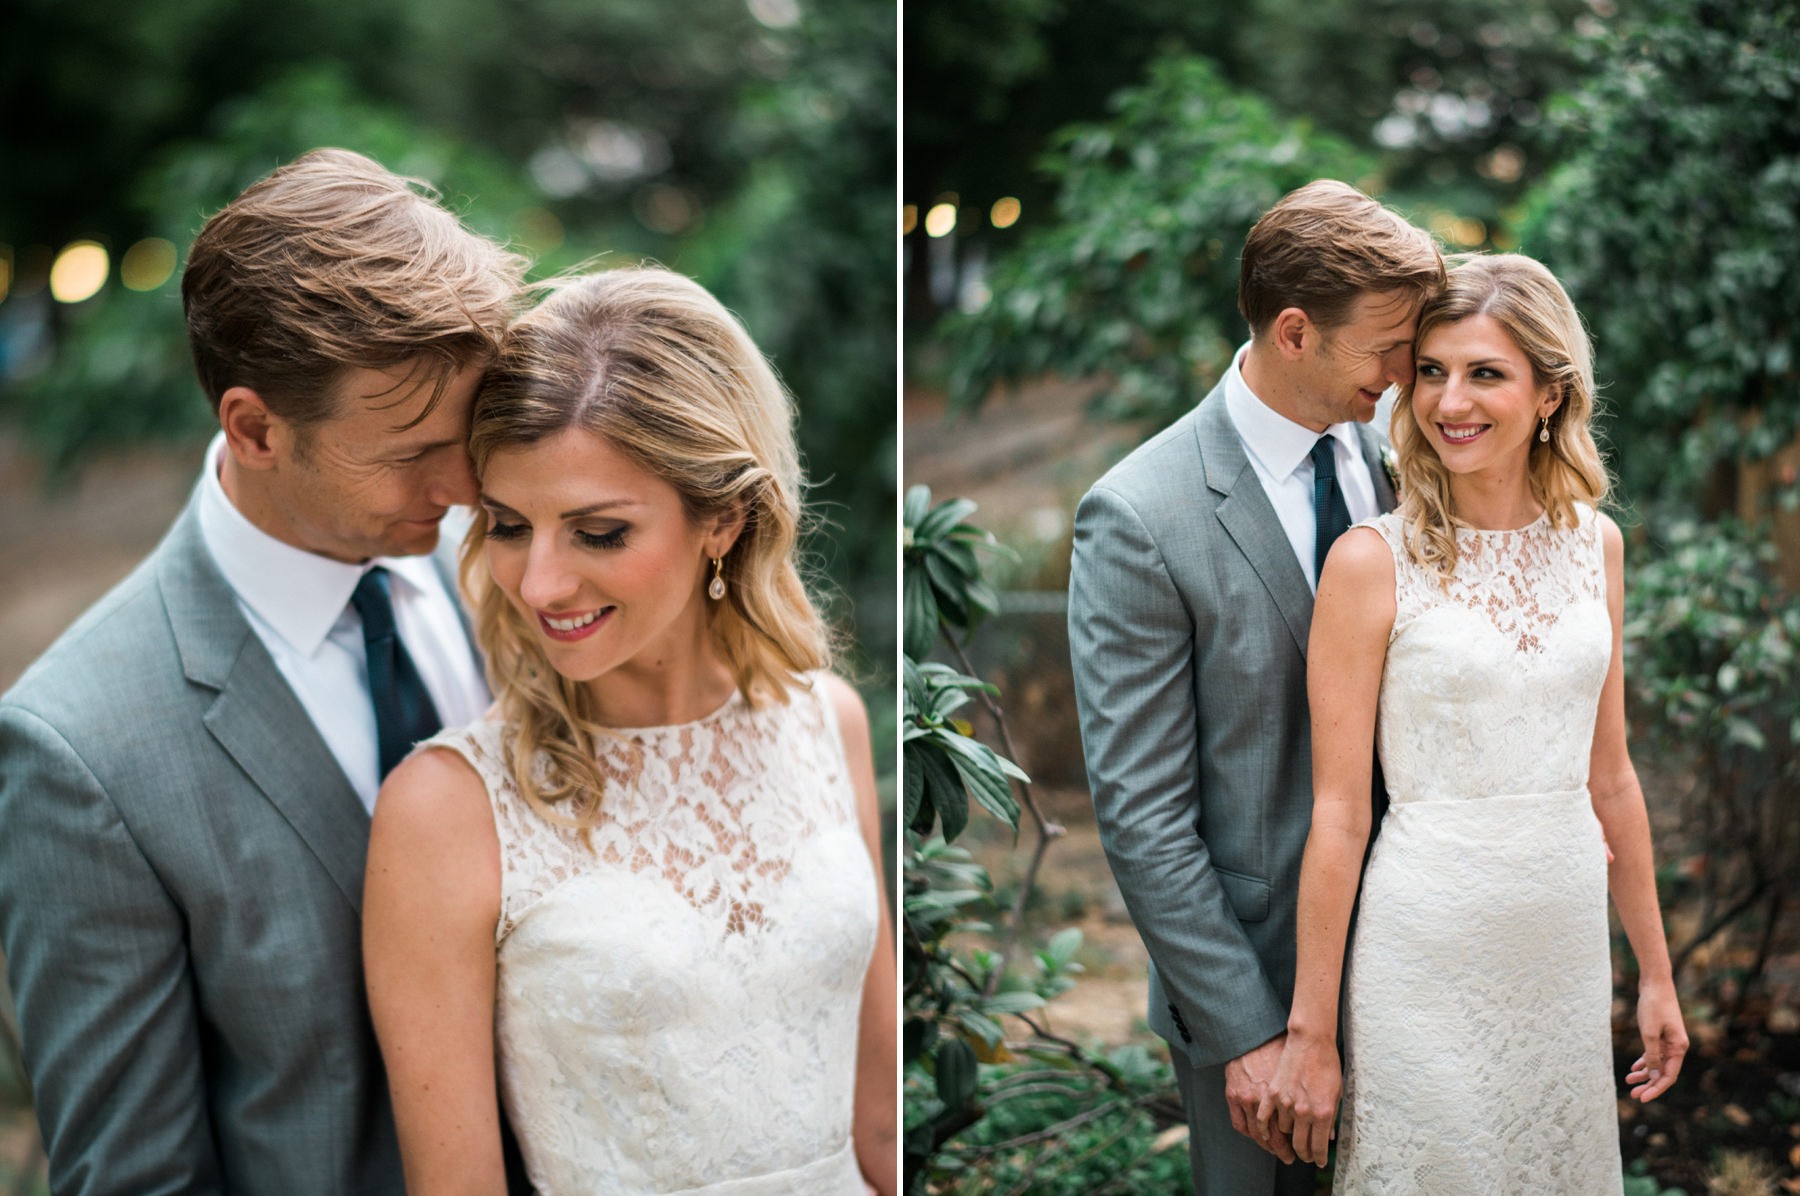 230-seattle-fine-art-wedding-portraits-at-the-corson-building.jpg